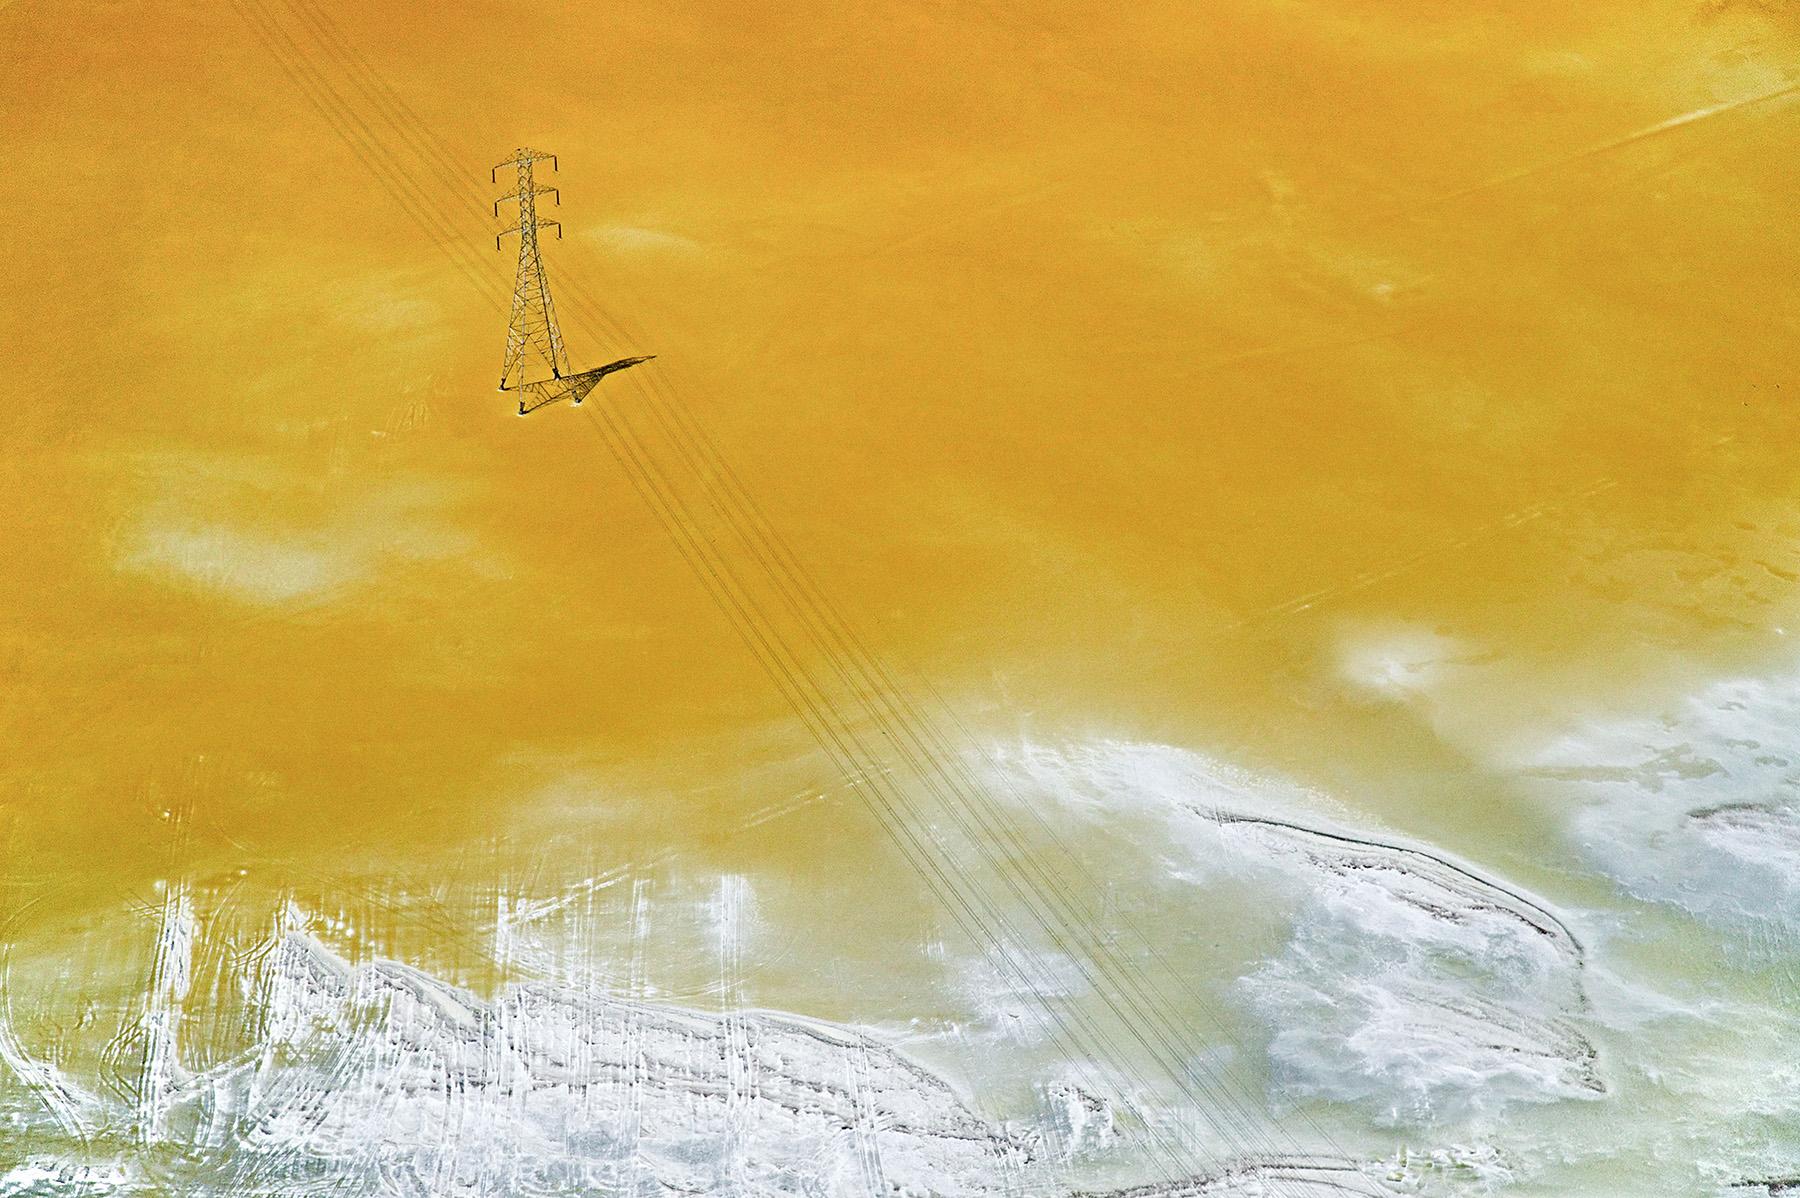 Colin_McRae_SF Bay Salt Ponds_Yellow Salt Pond_6.jpg